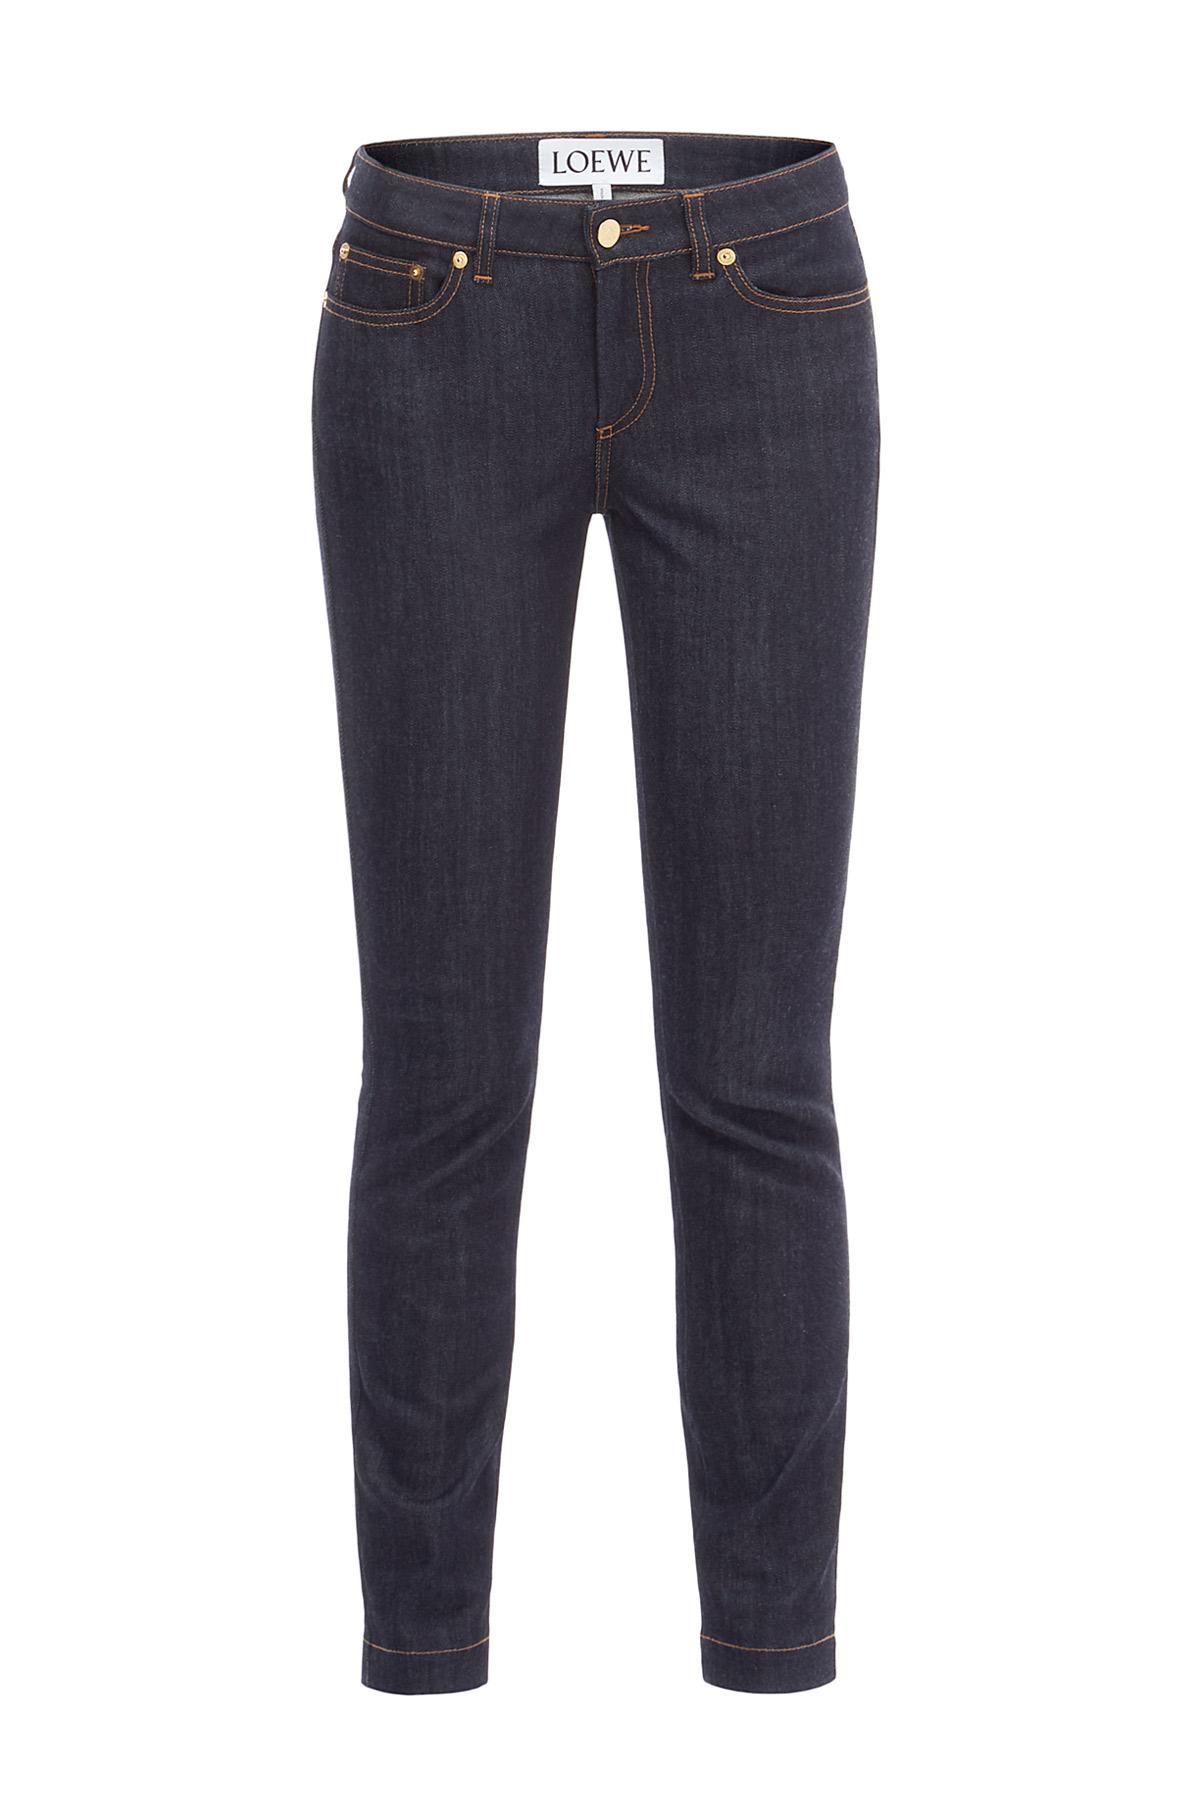 LOEWE Skinny Jeans Azul Denim Oscuro front